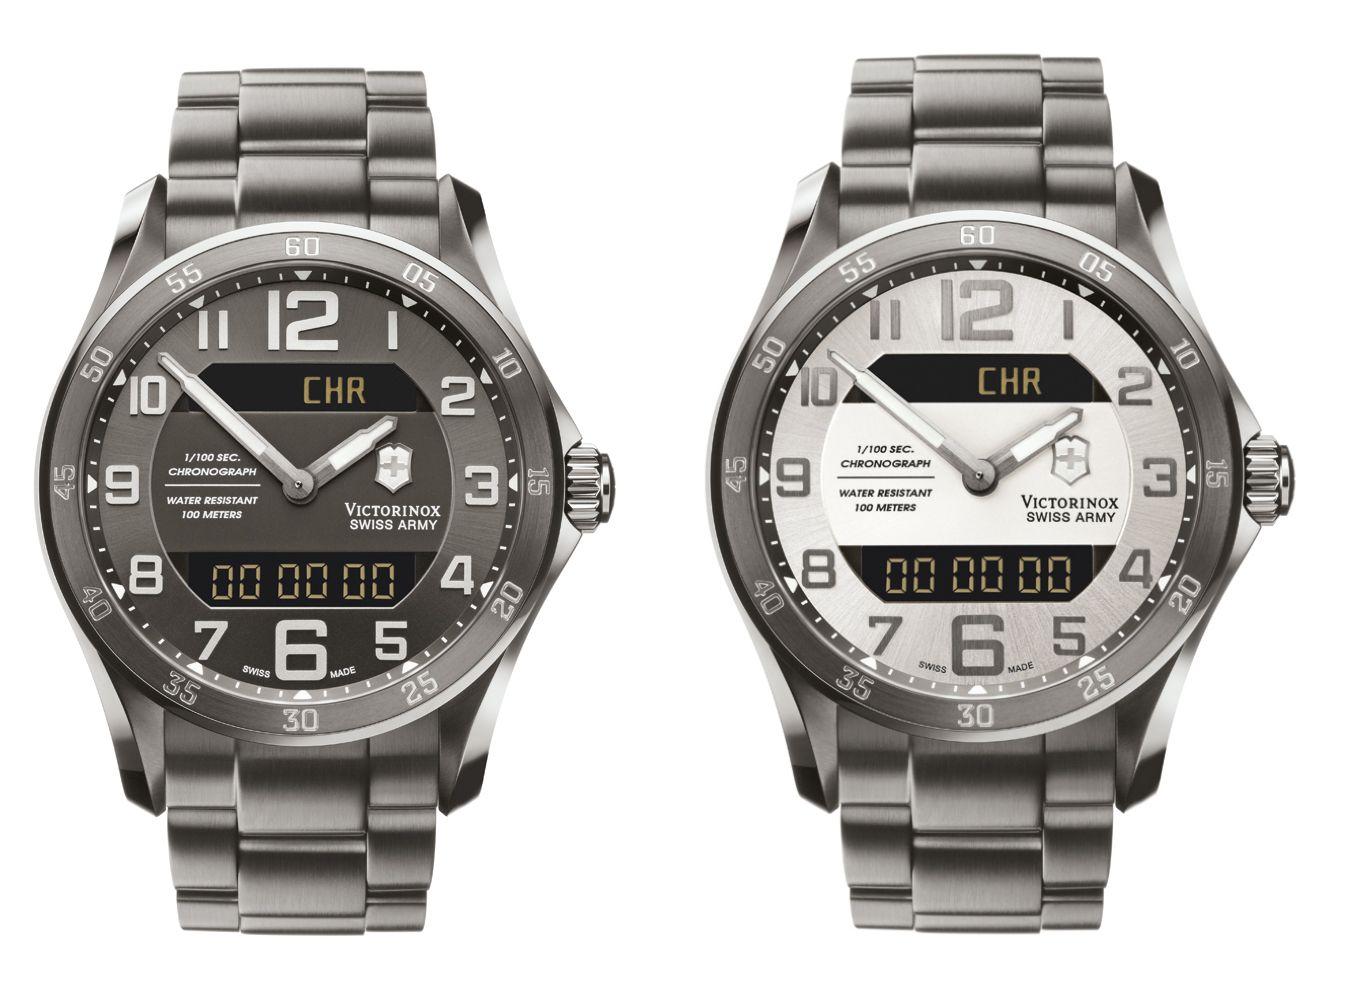 swiss army chrono classic multitask watch